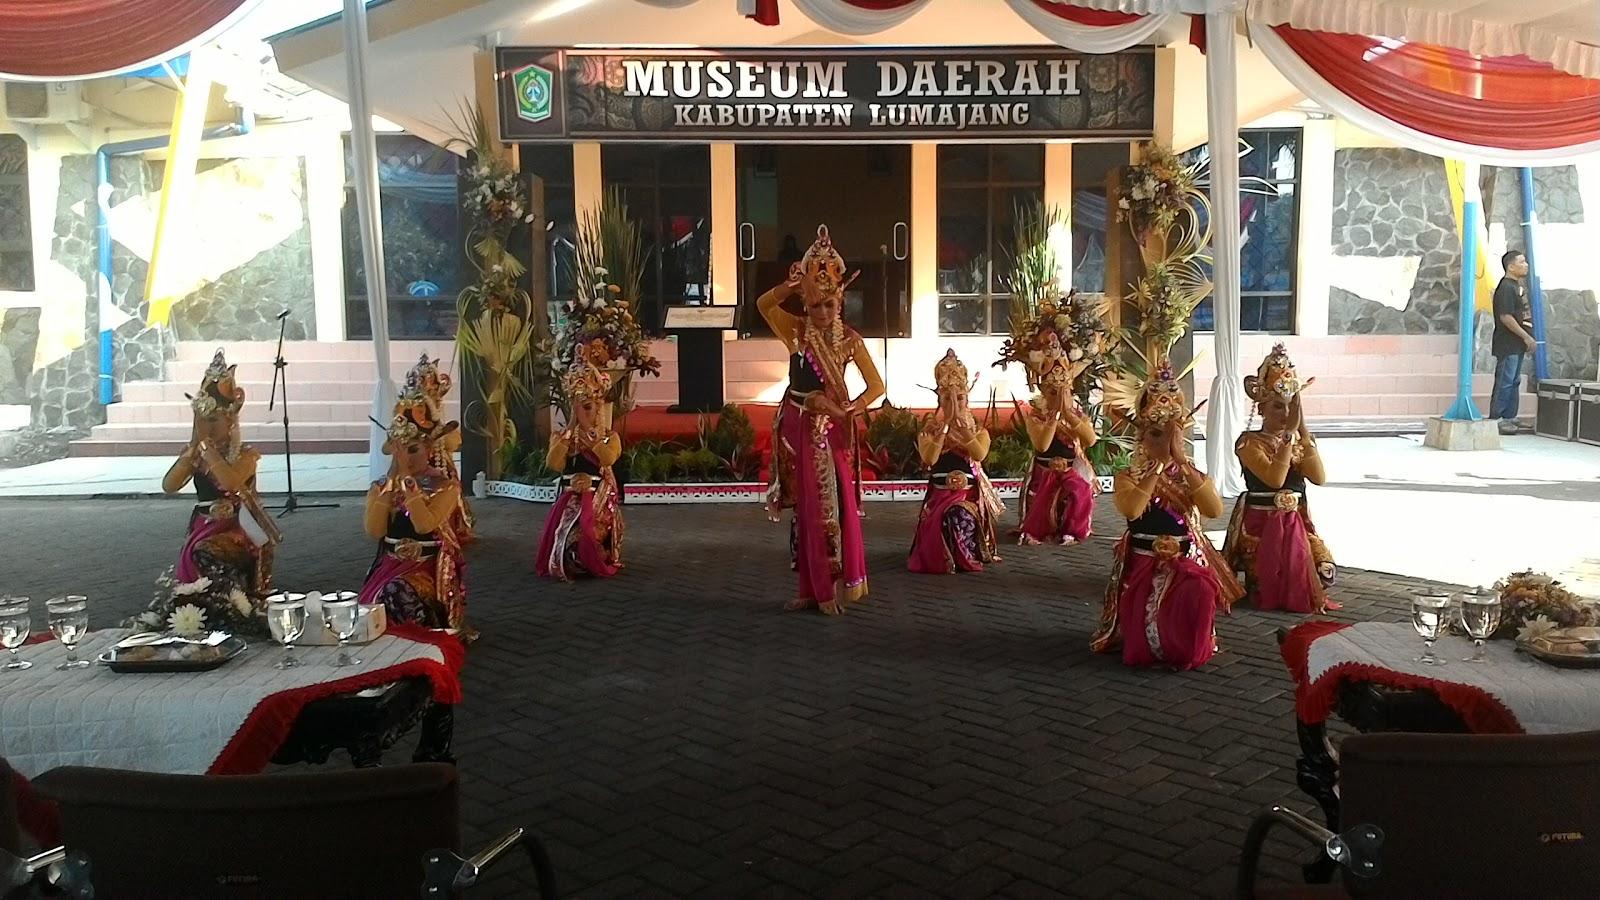 Yuk Mengunjungi Museum Daerah Kabupaten Lumajang Oleh Aries Probolinggo Cakraningrat